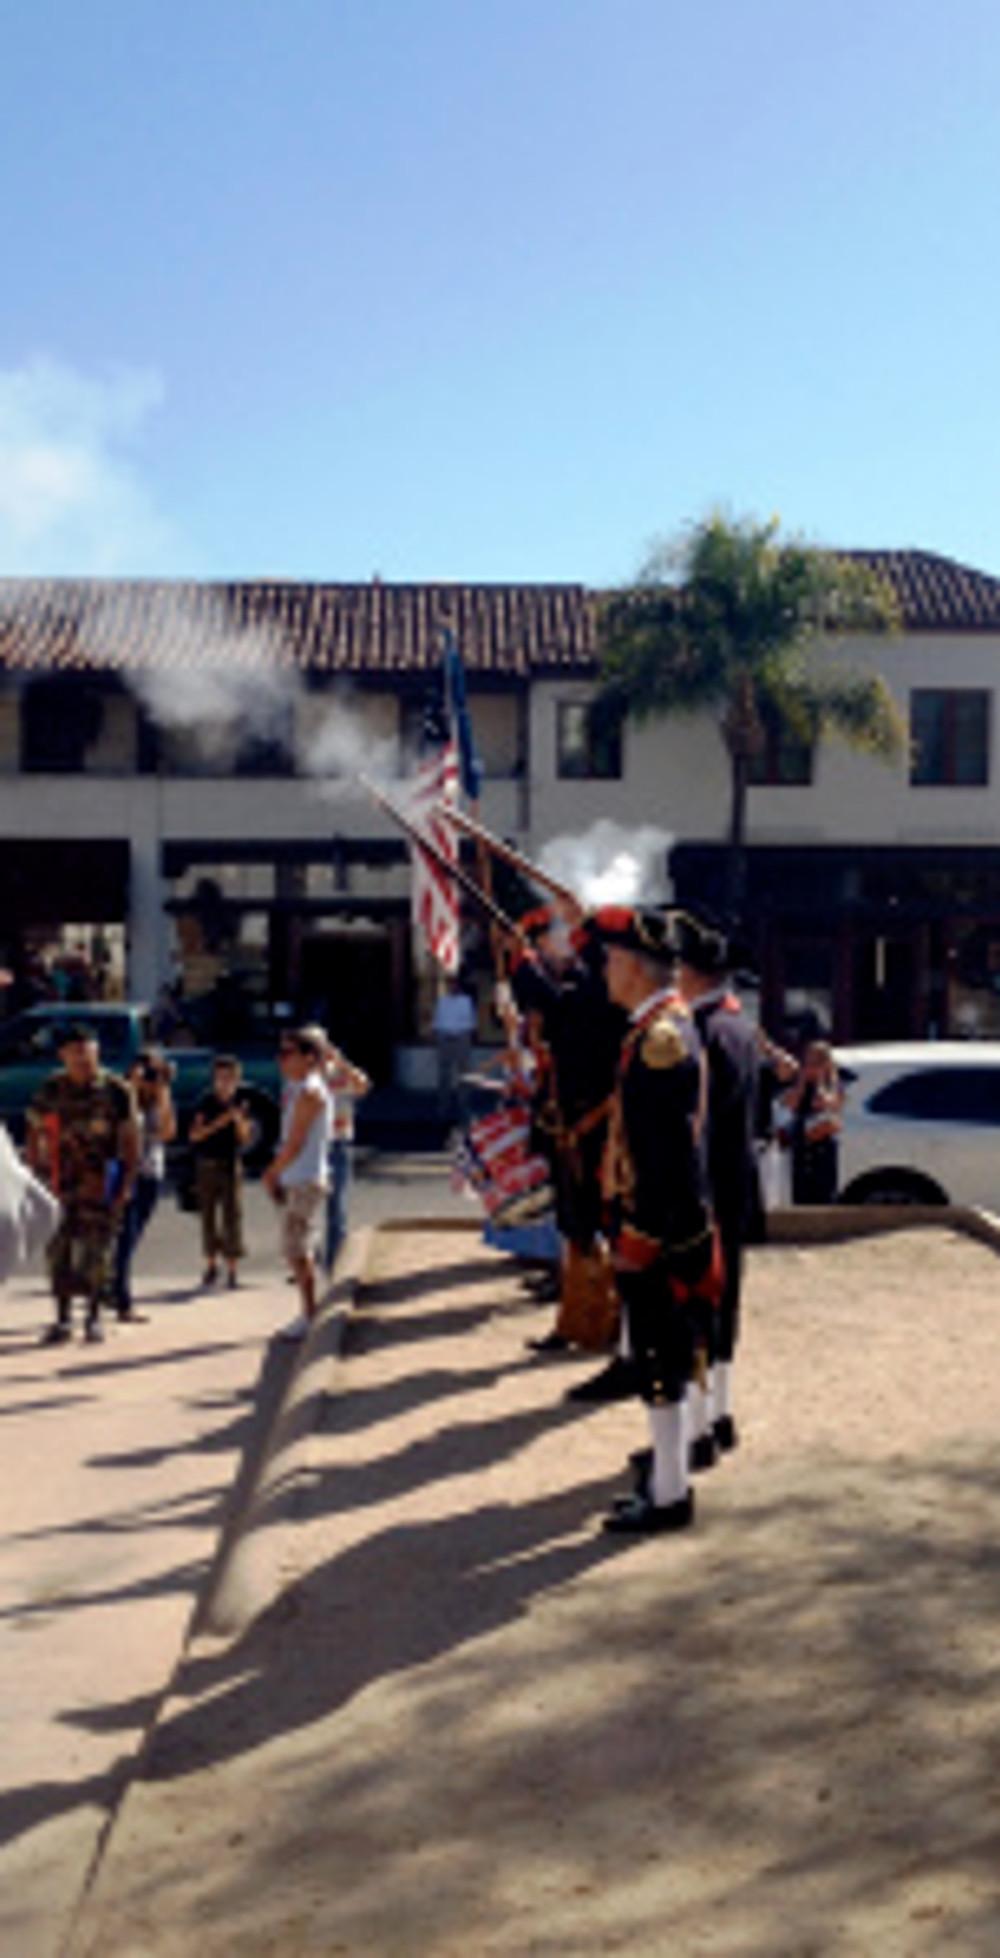 Los Soldados fire muskets. Photo by Brittany Avila.